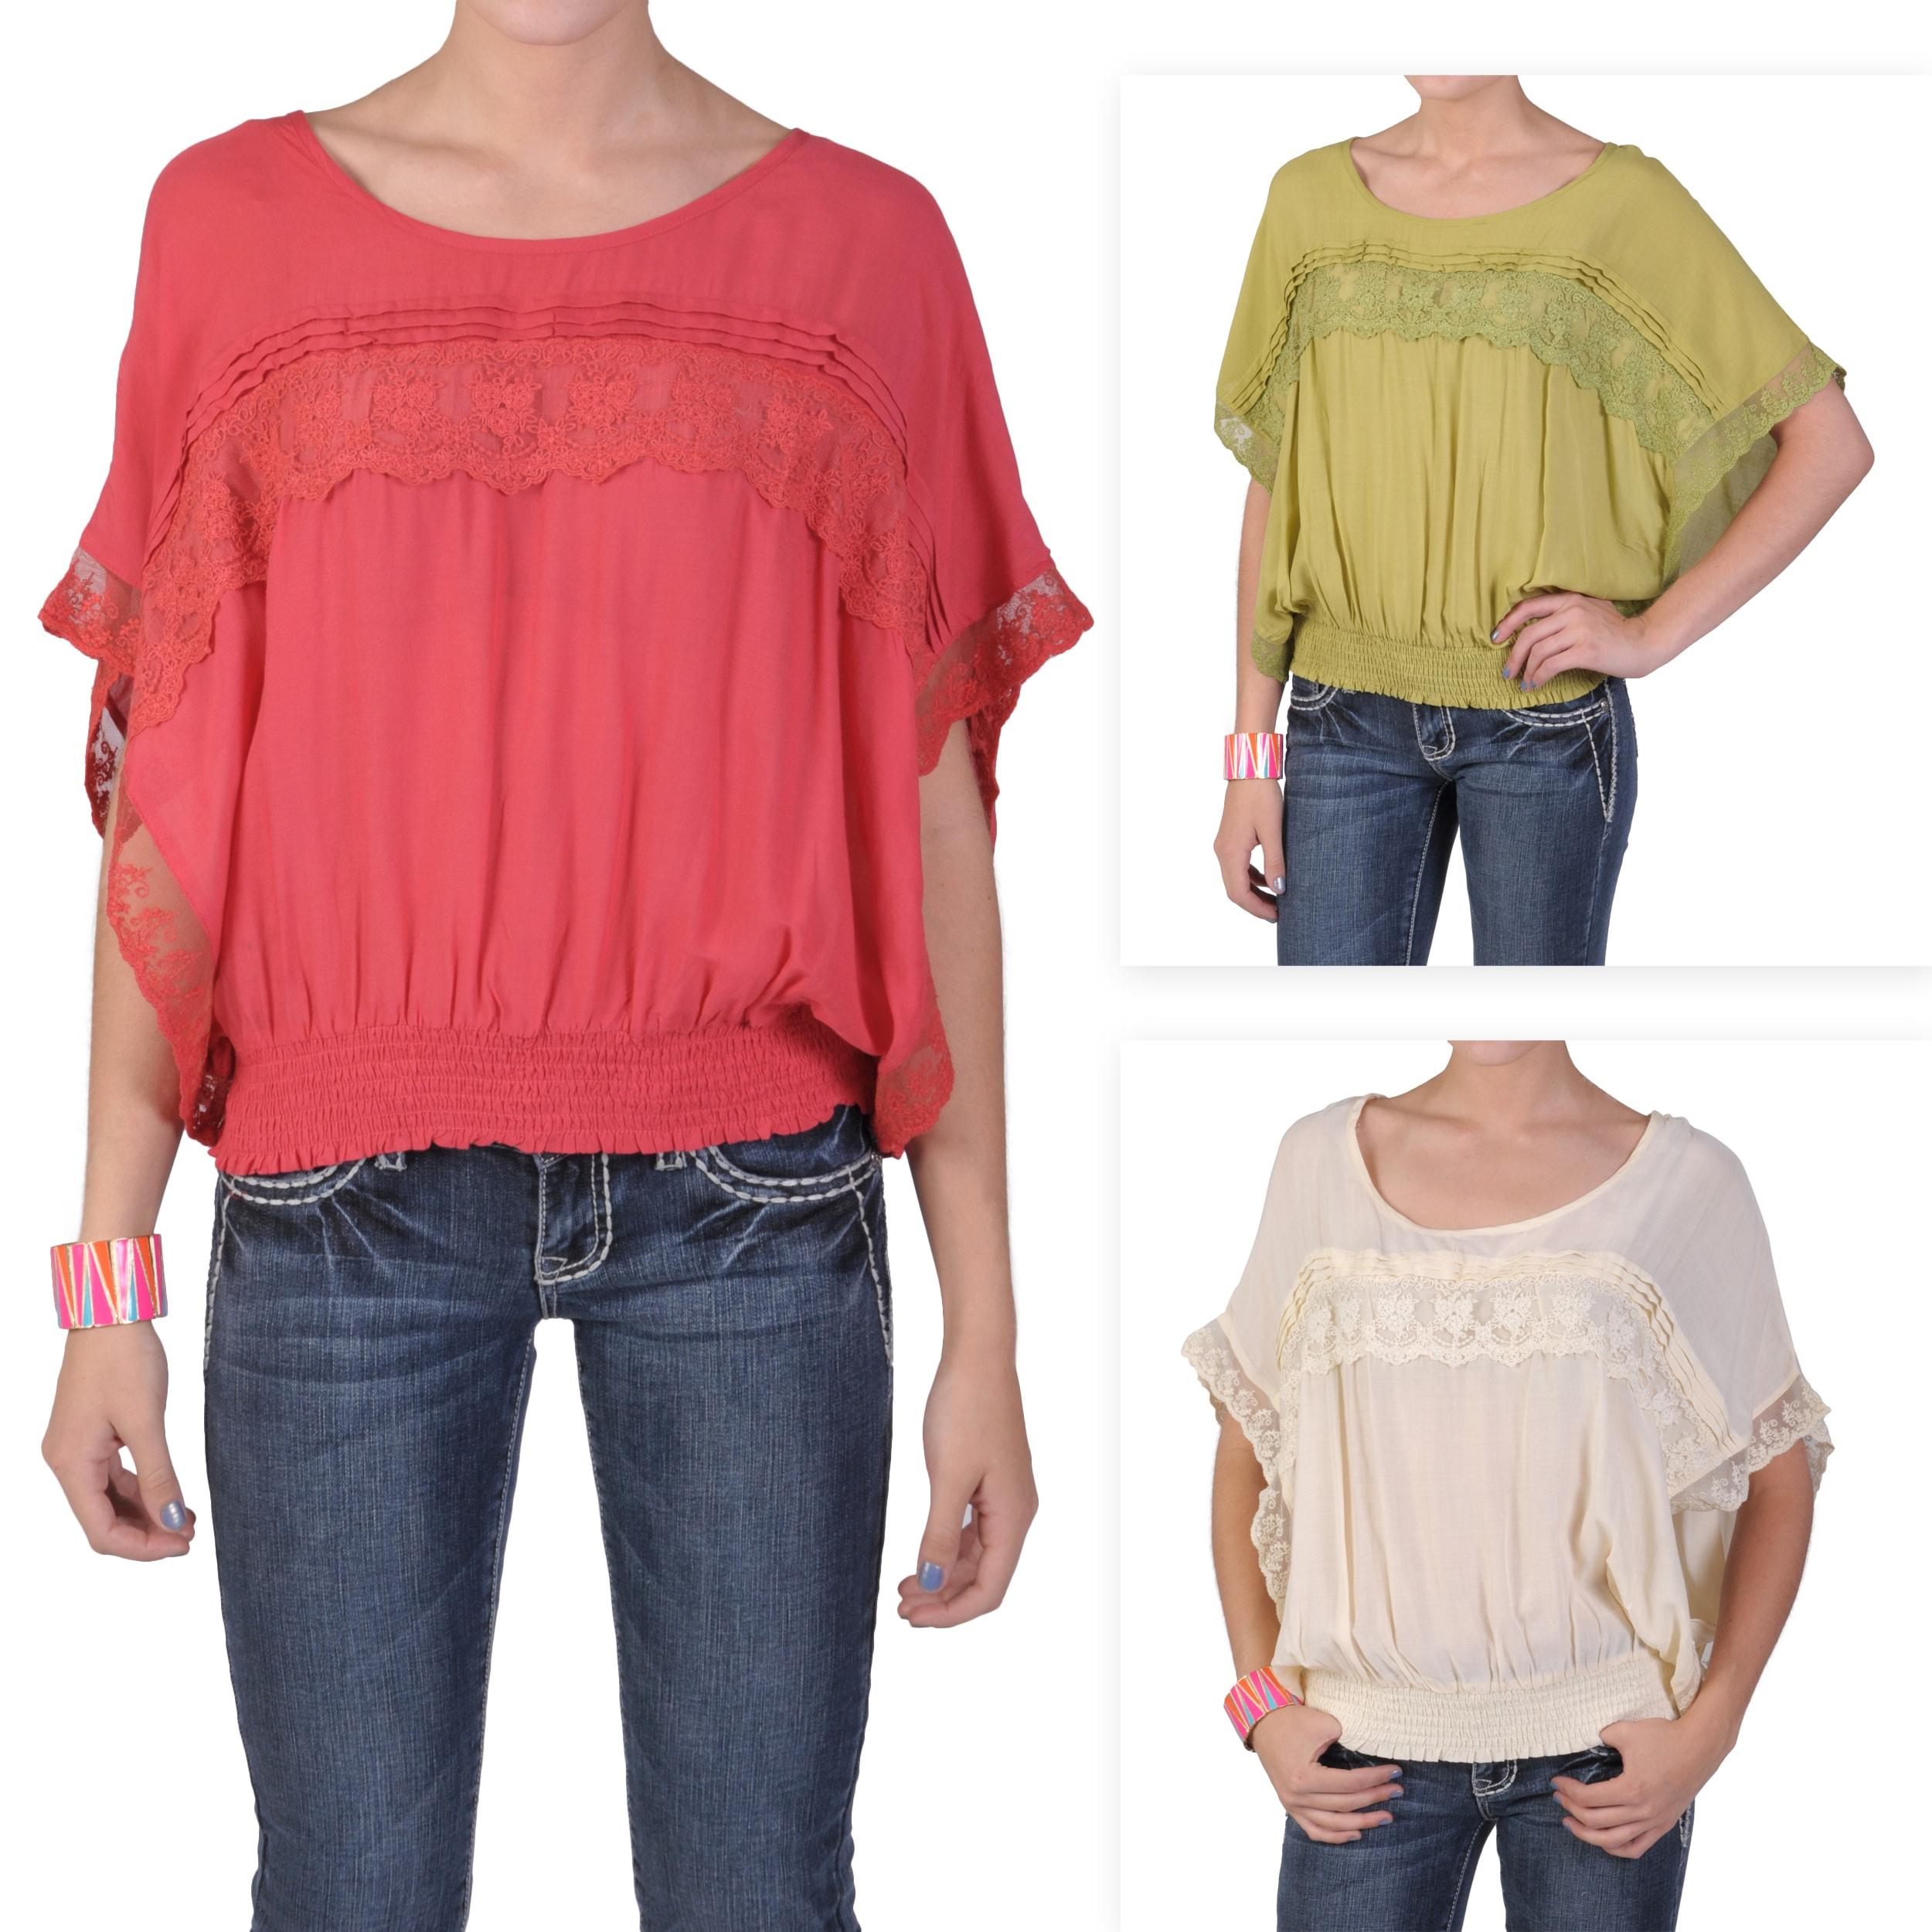 Tressa Designs Women's Contemporary Plus Wide Sleeve Lace Detail Top